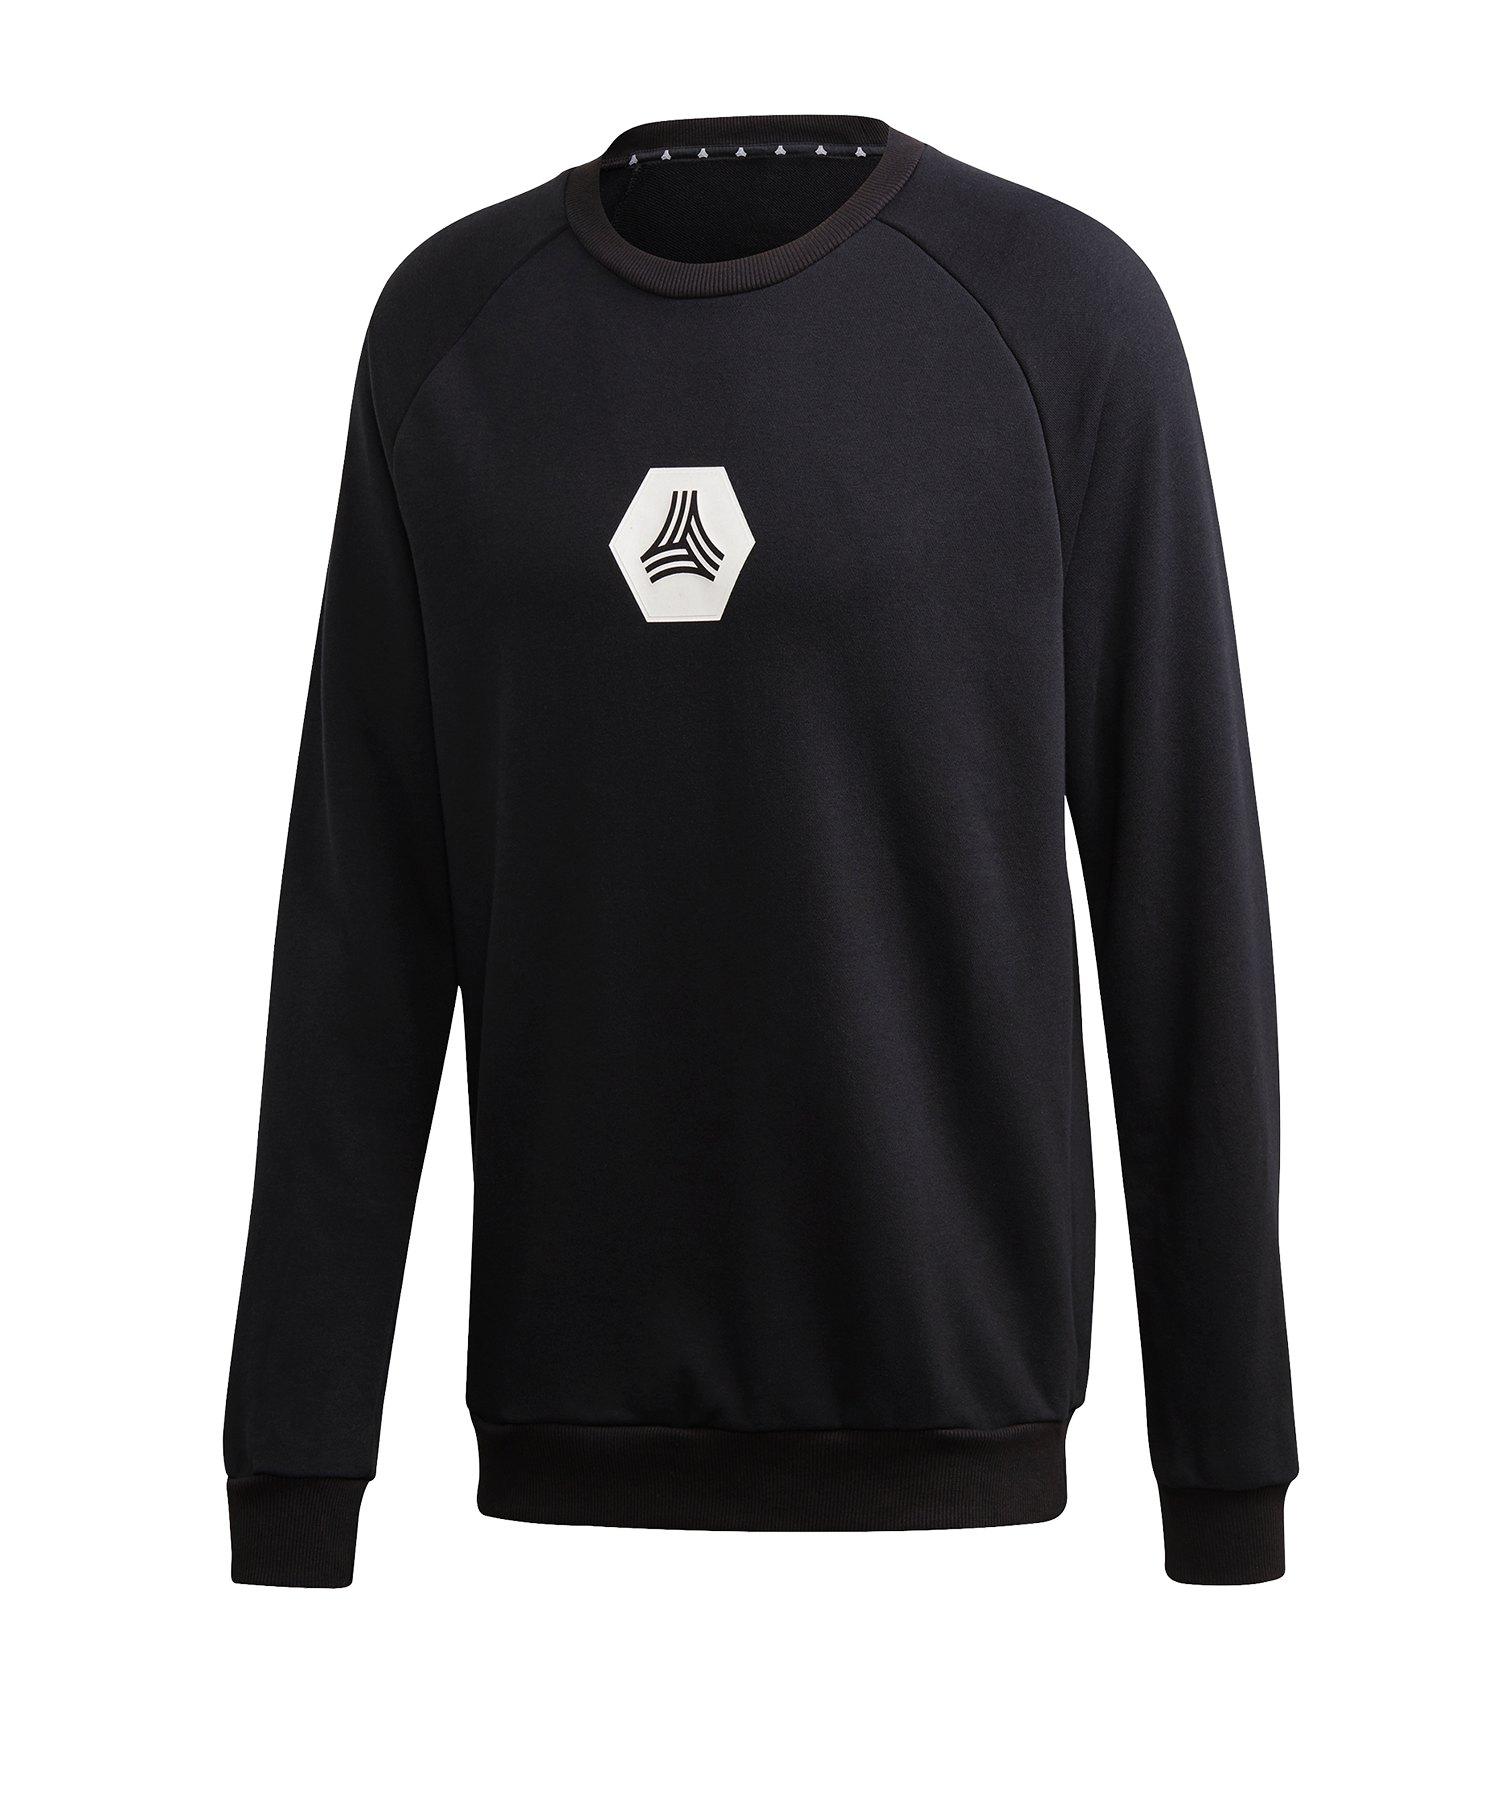 adidas Tango Logo Sweatshirt langarm Schwarz - schwarz